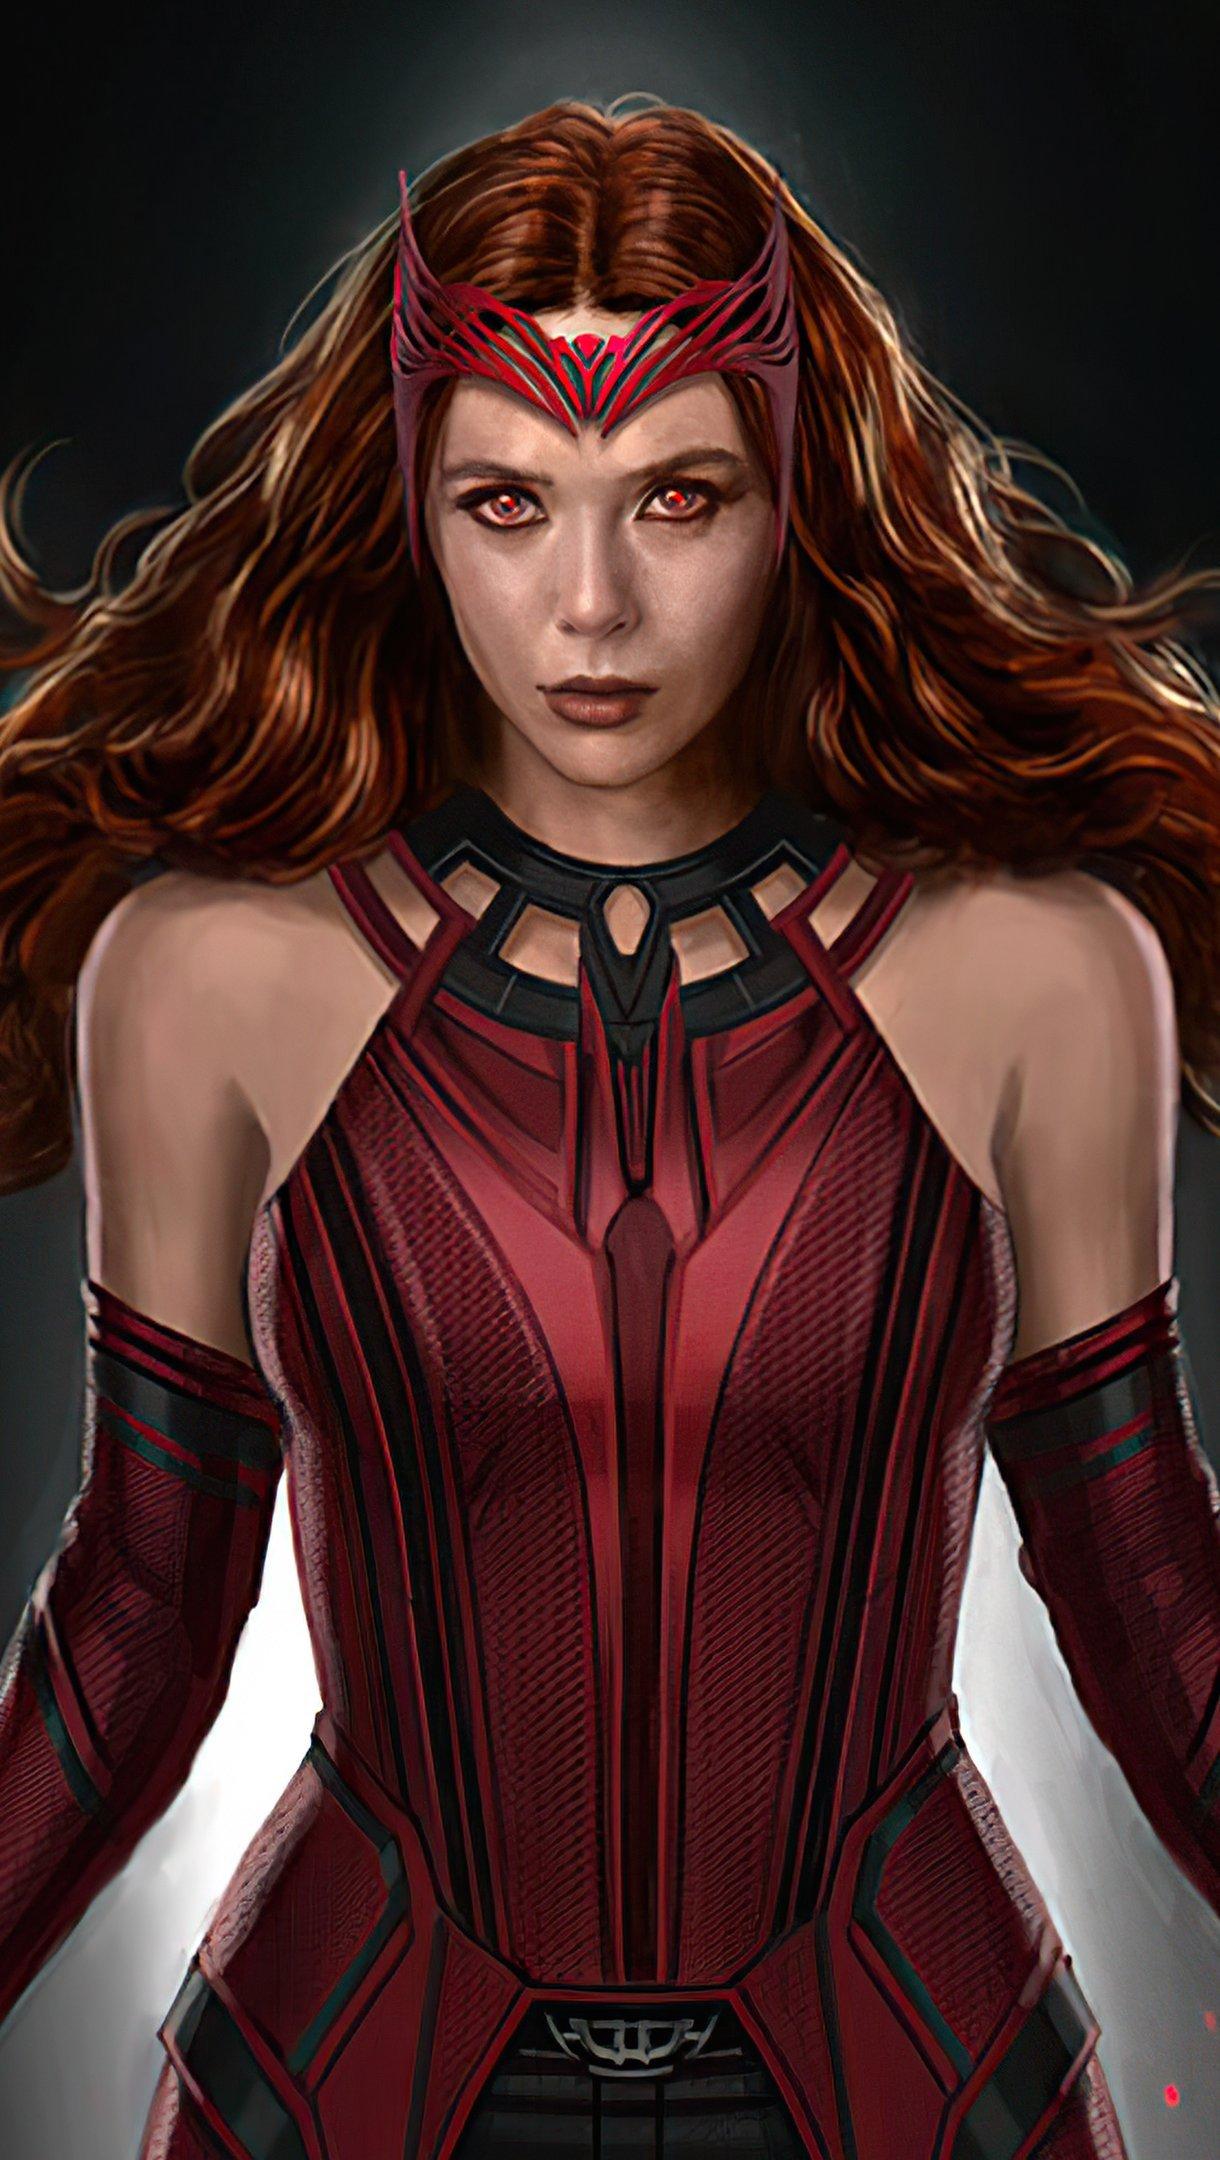 Wallpaper Scarlet Witch Fanart 2021 Vertical